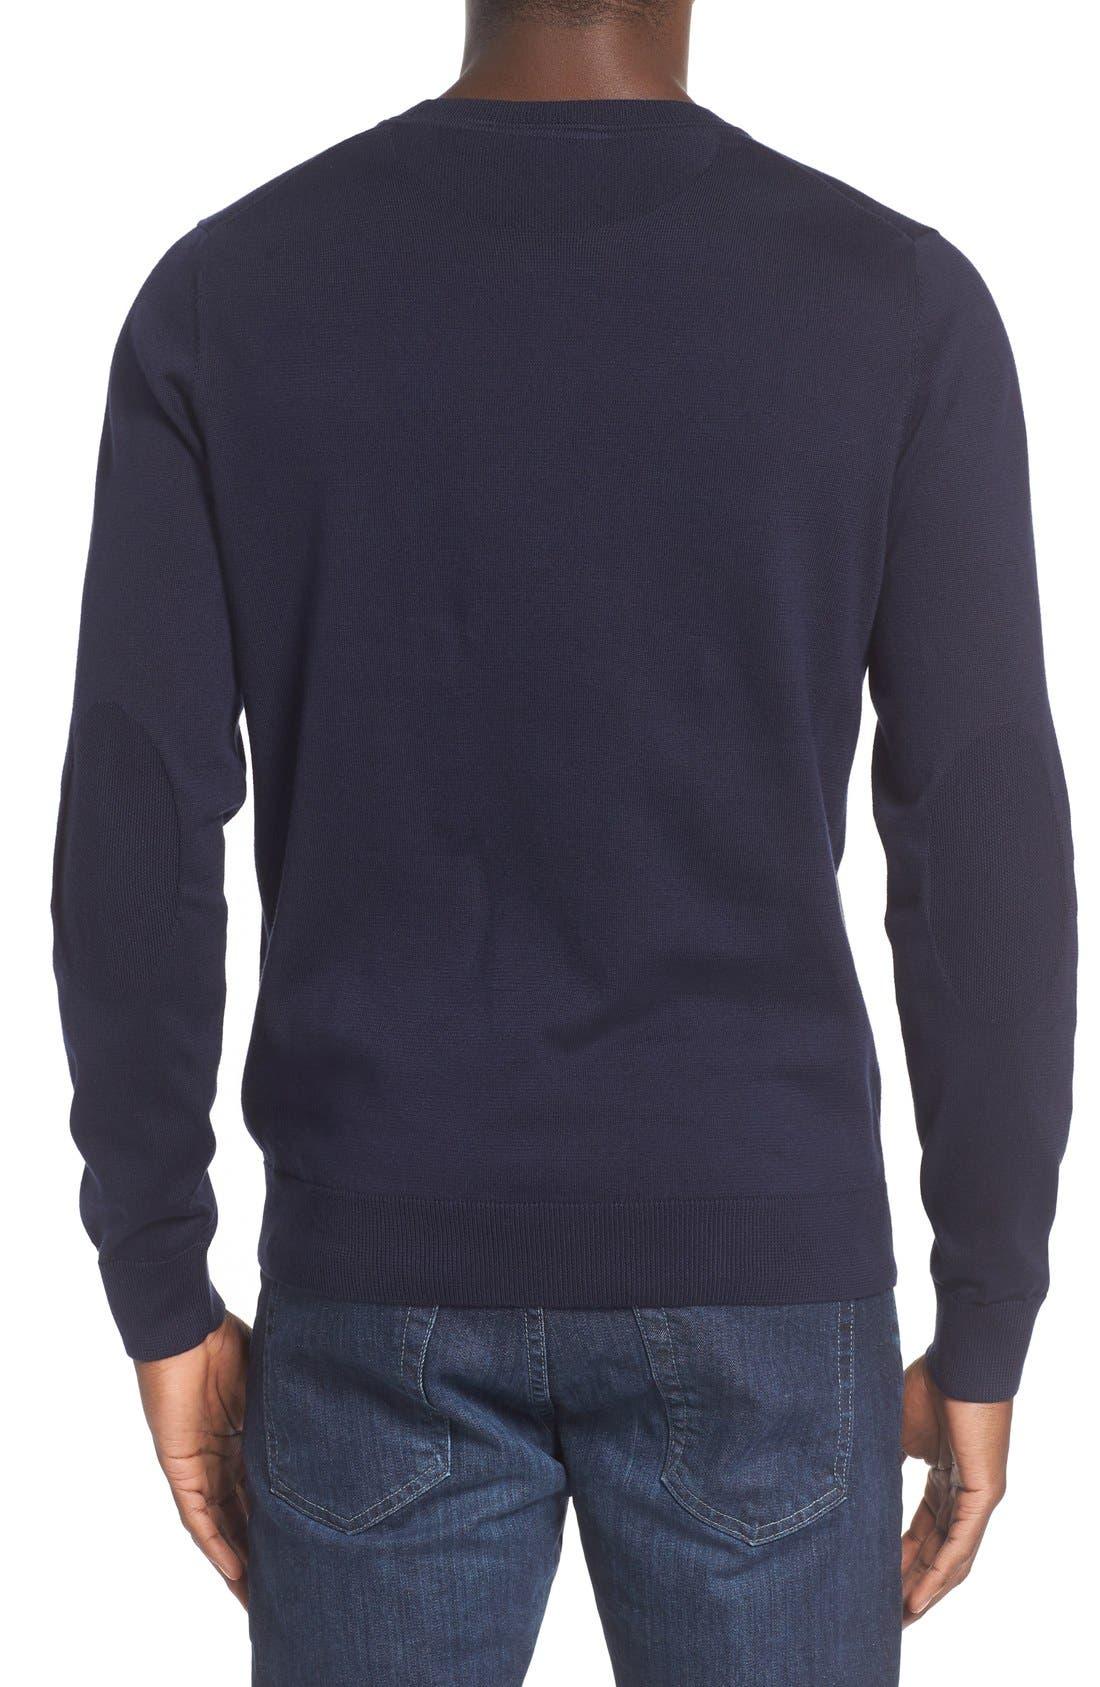 Jersey Knit Crewneck Sweater,                             Alternate thumbnail 2, color,                             Navy Blue